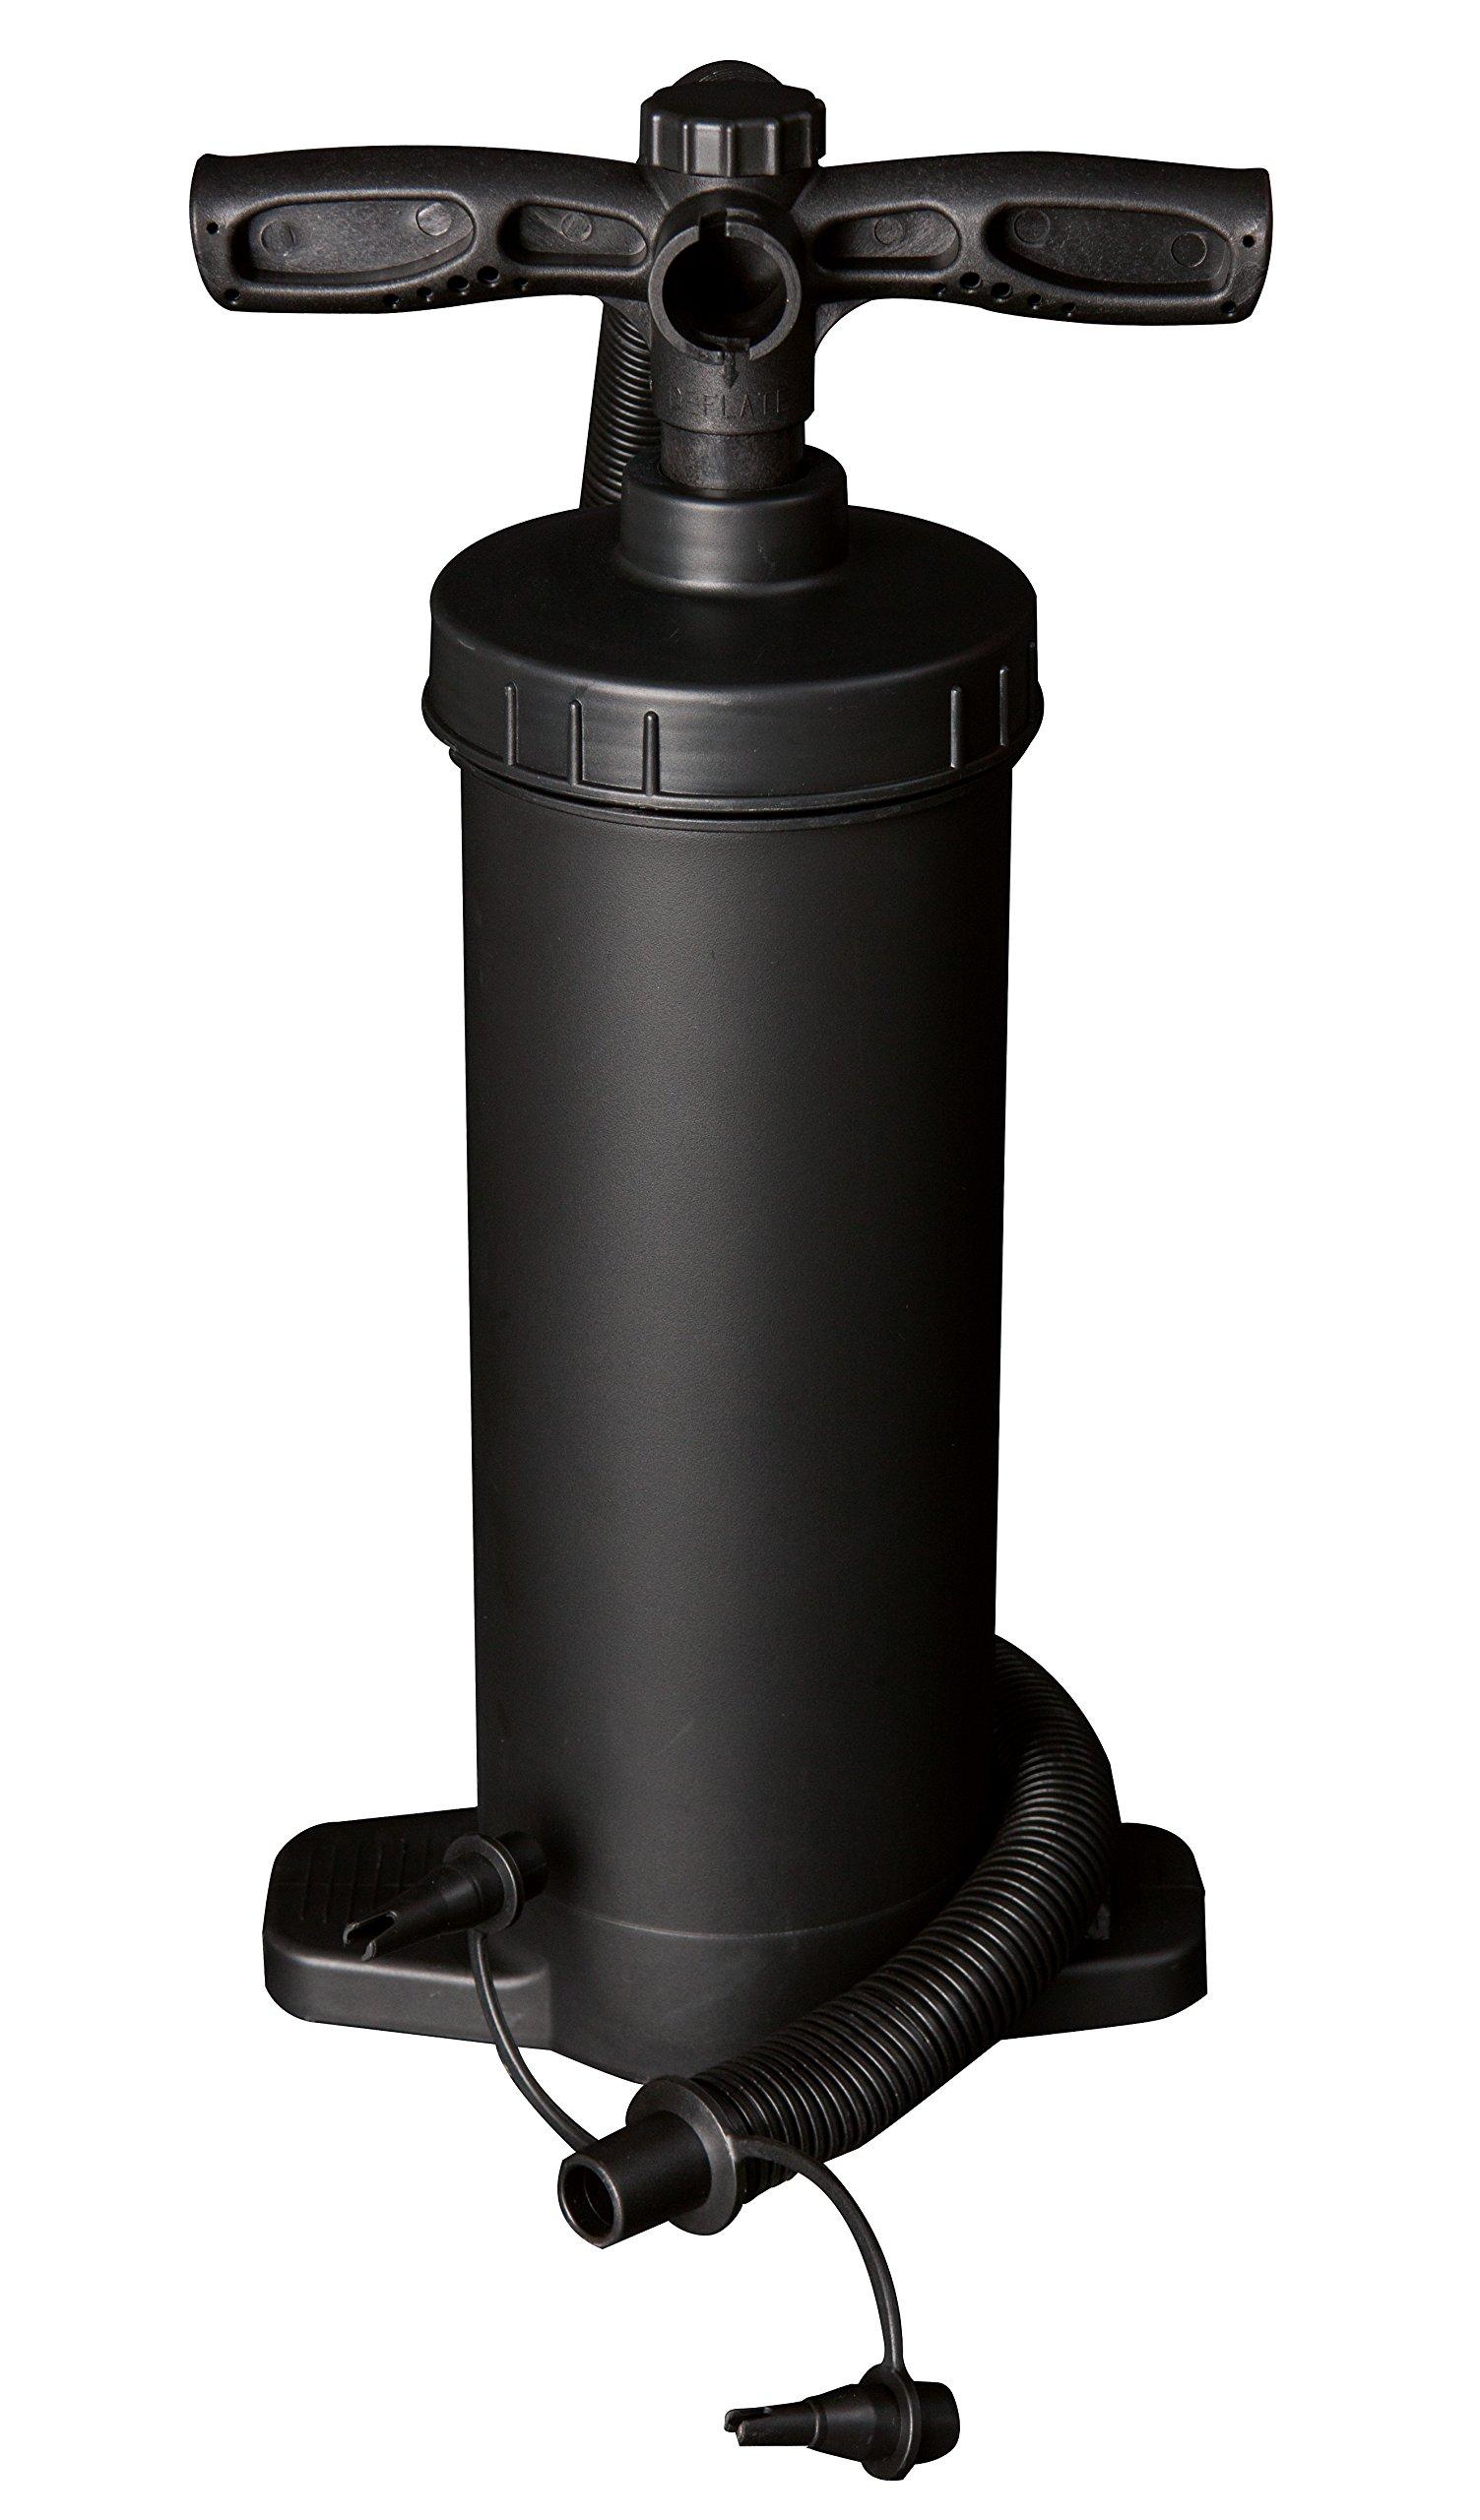 Bestway Air Hammer Inflation Pump 4